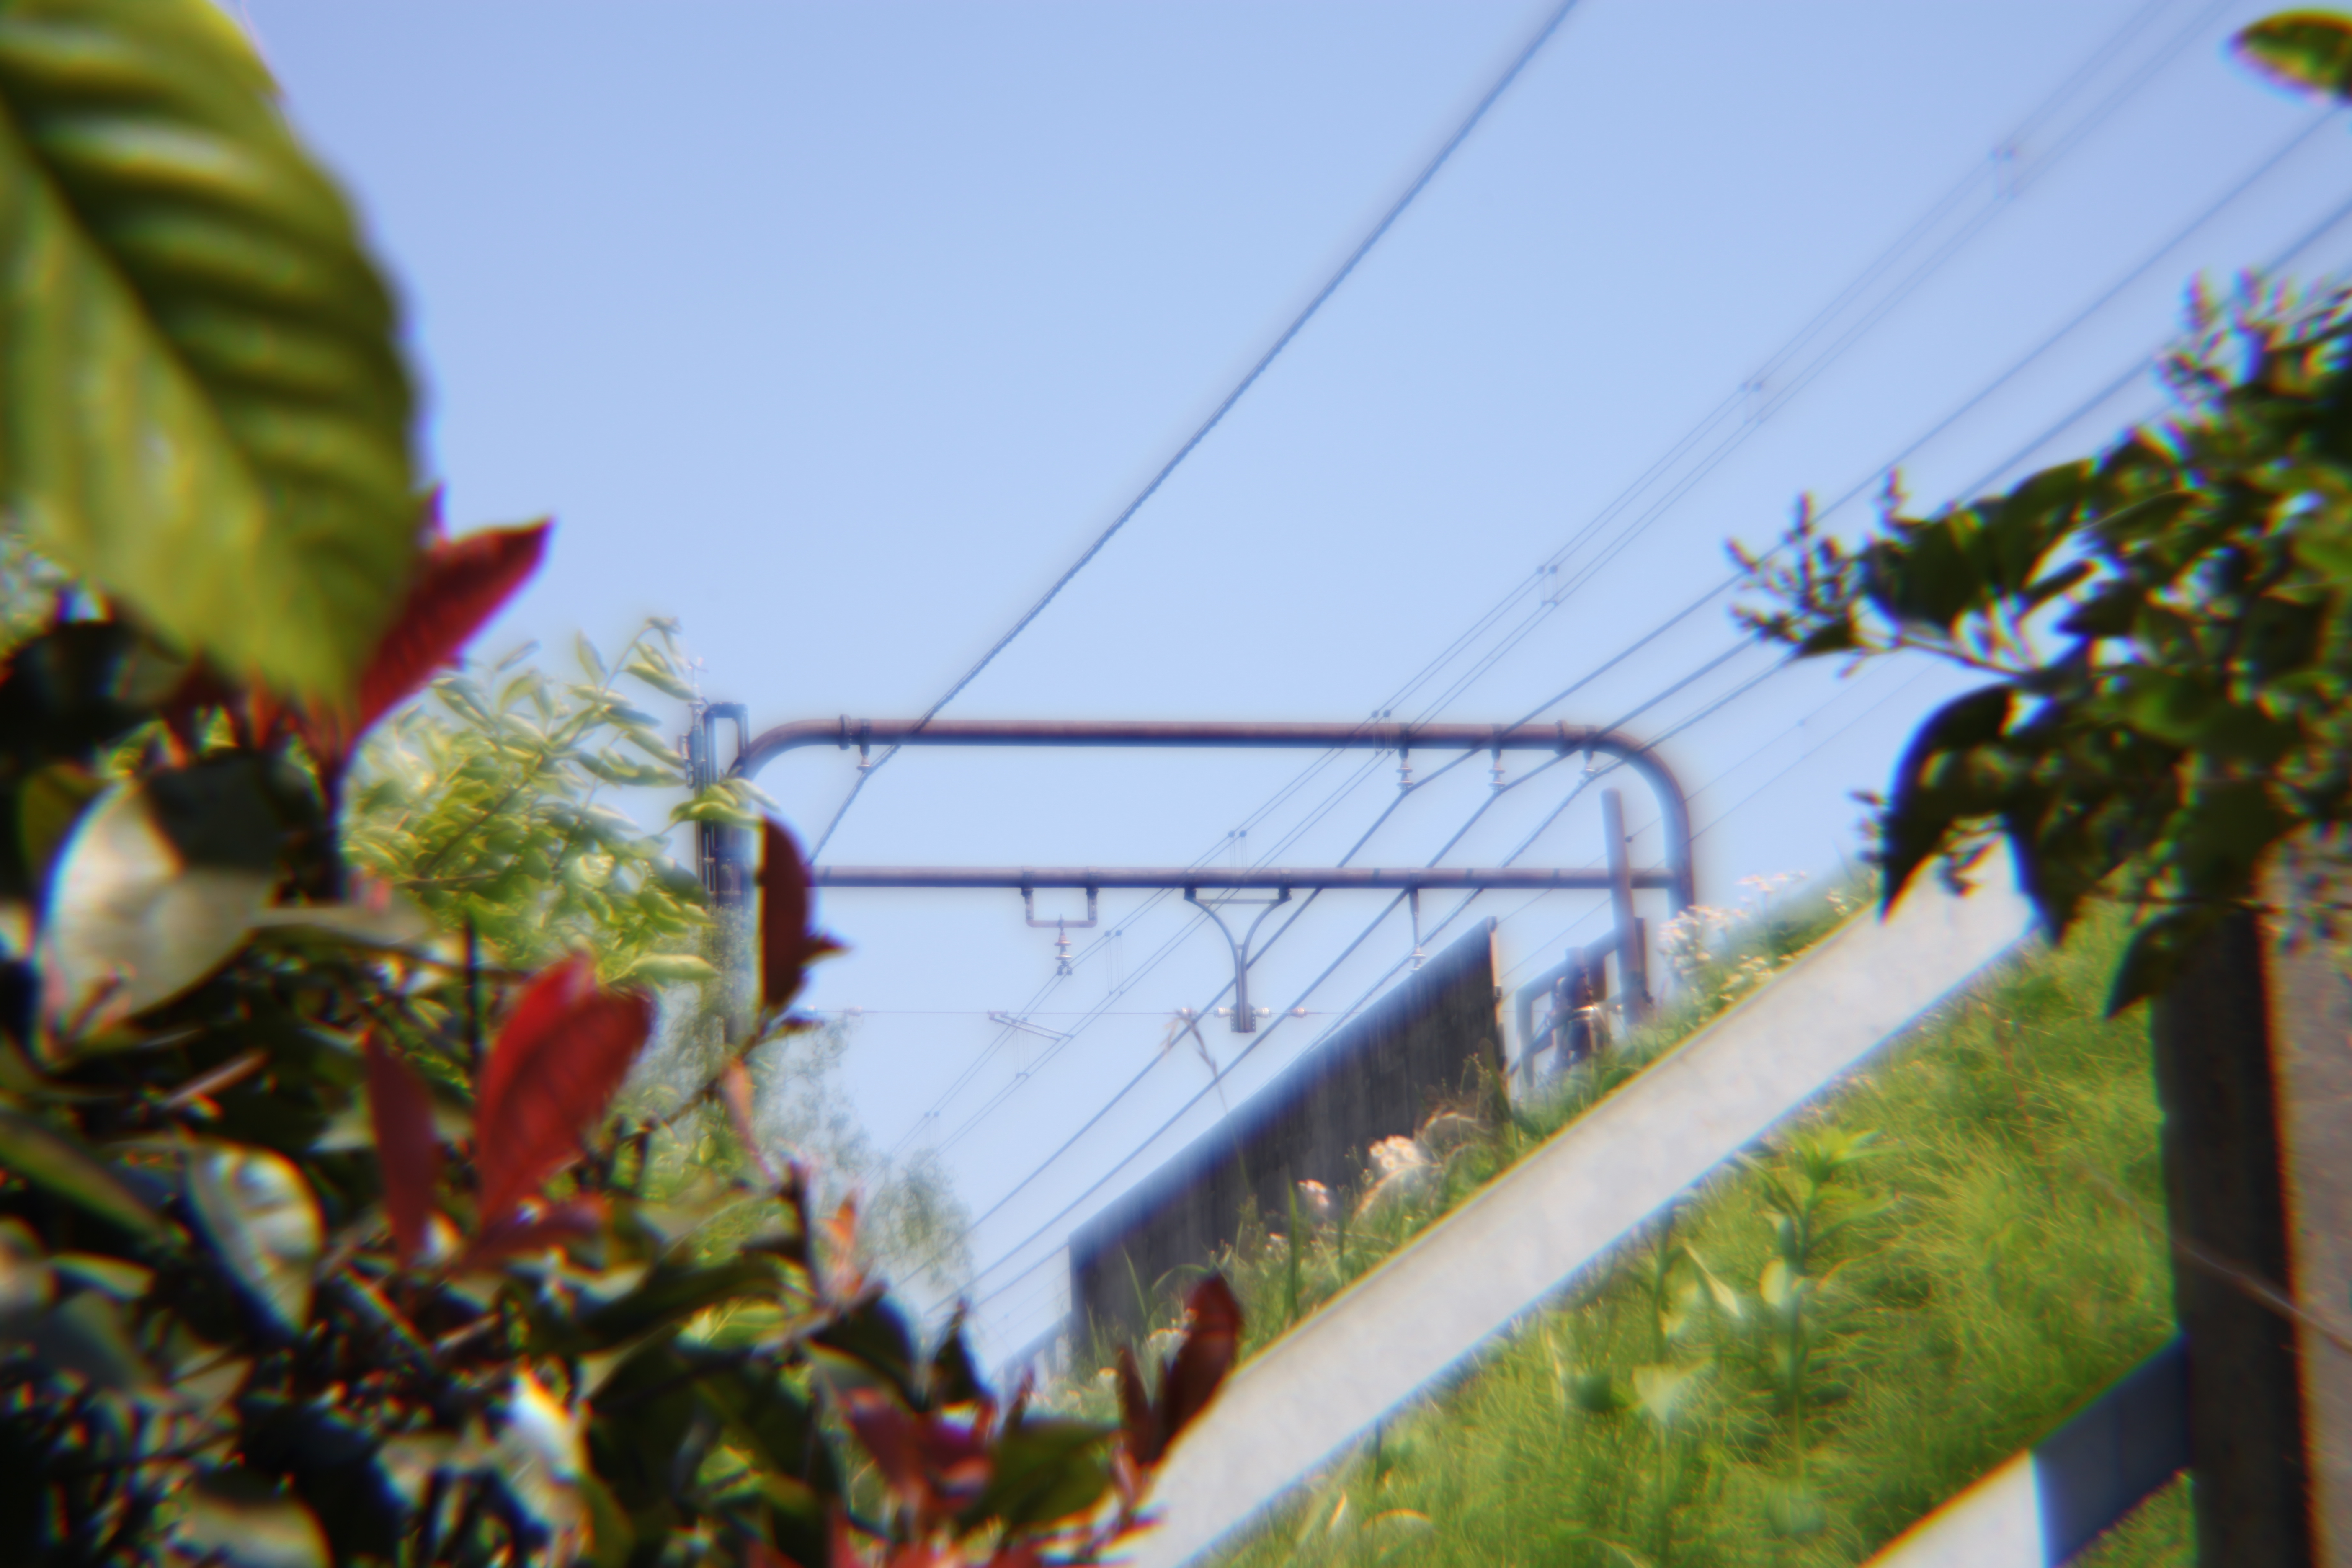 <b>EOS 5D Mark II / Diana Lens+ 110mm Soft Telephoto / 5,616×3,744 / 1/200秒 / 0EV / ISO100 / 絞り優先AE / WB:オート / 110mm</b>